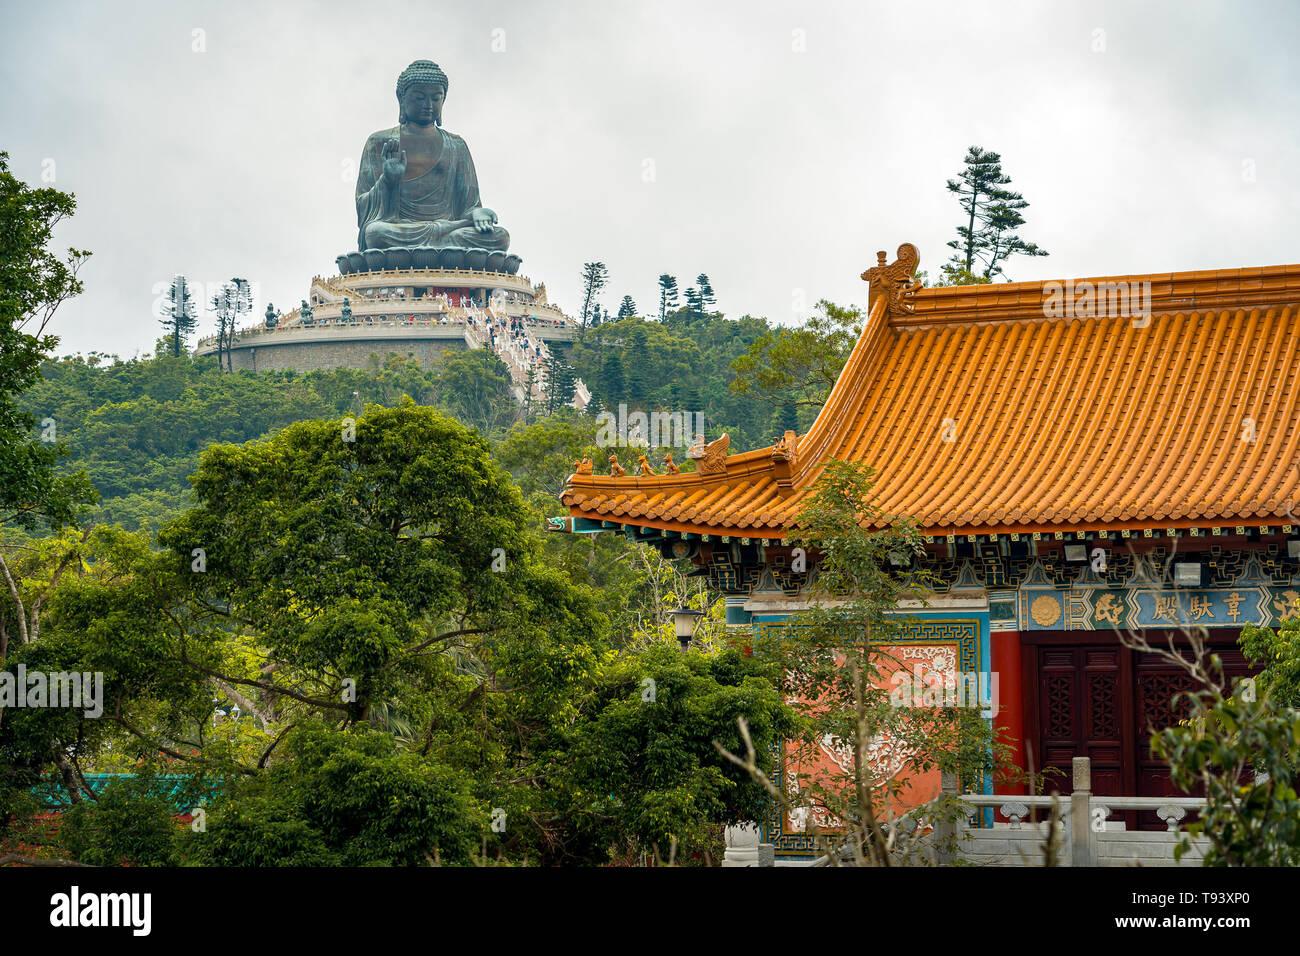 Hong Kong, China - Big Buddha statue (view from Po Lin Monastery) - Stock Image